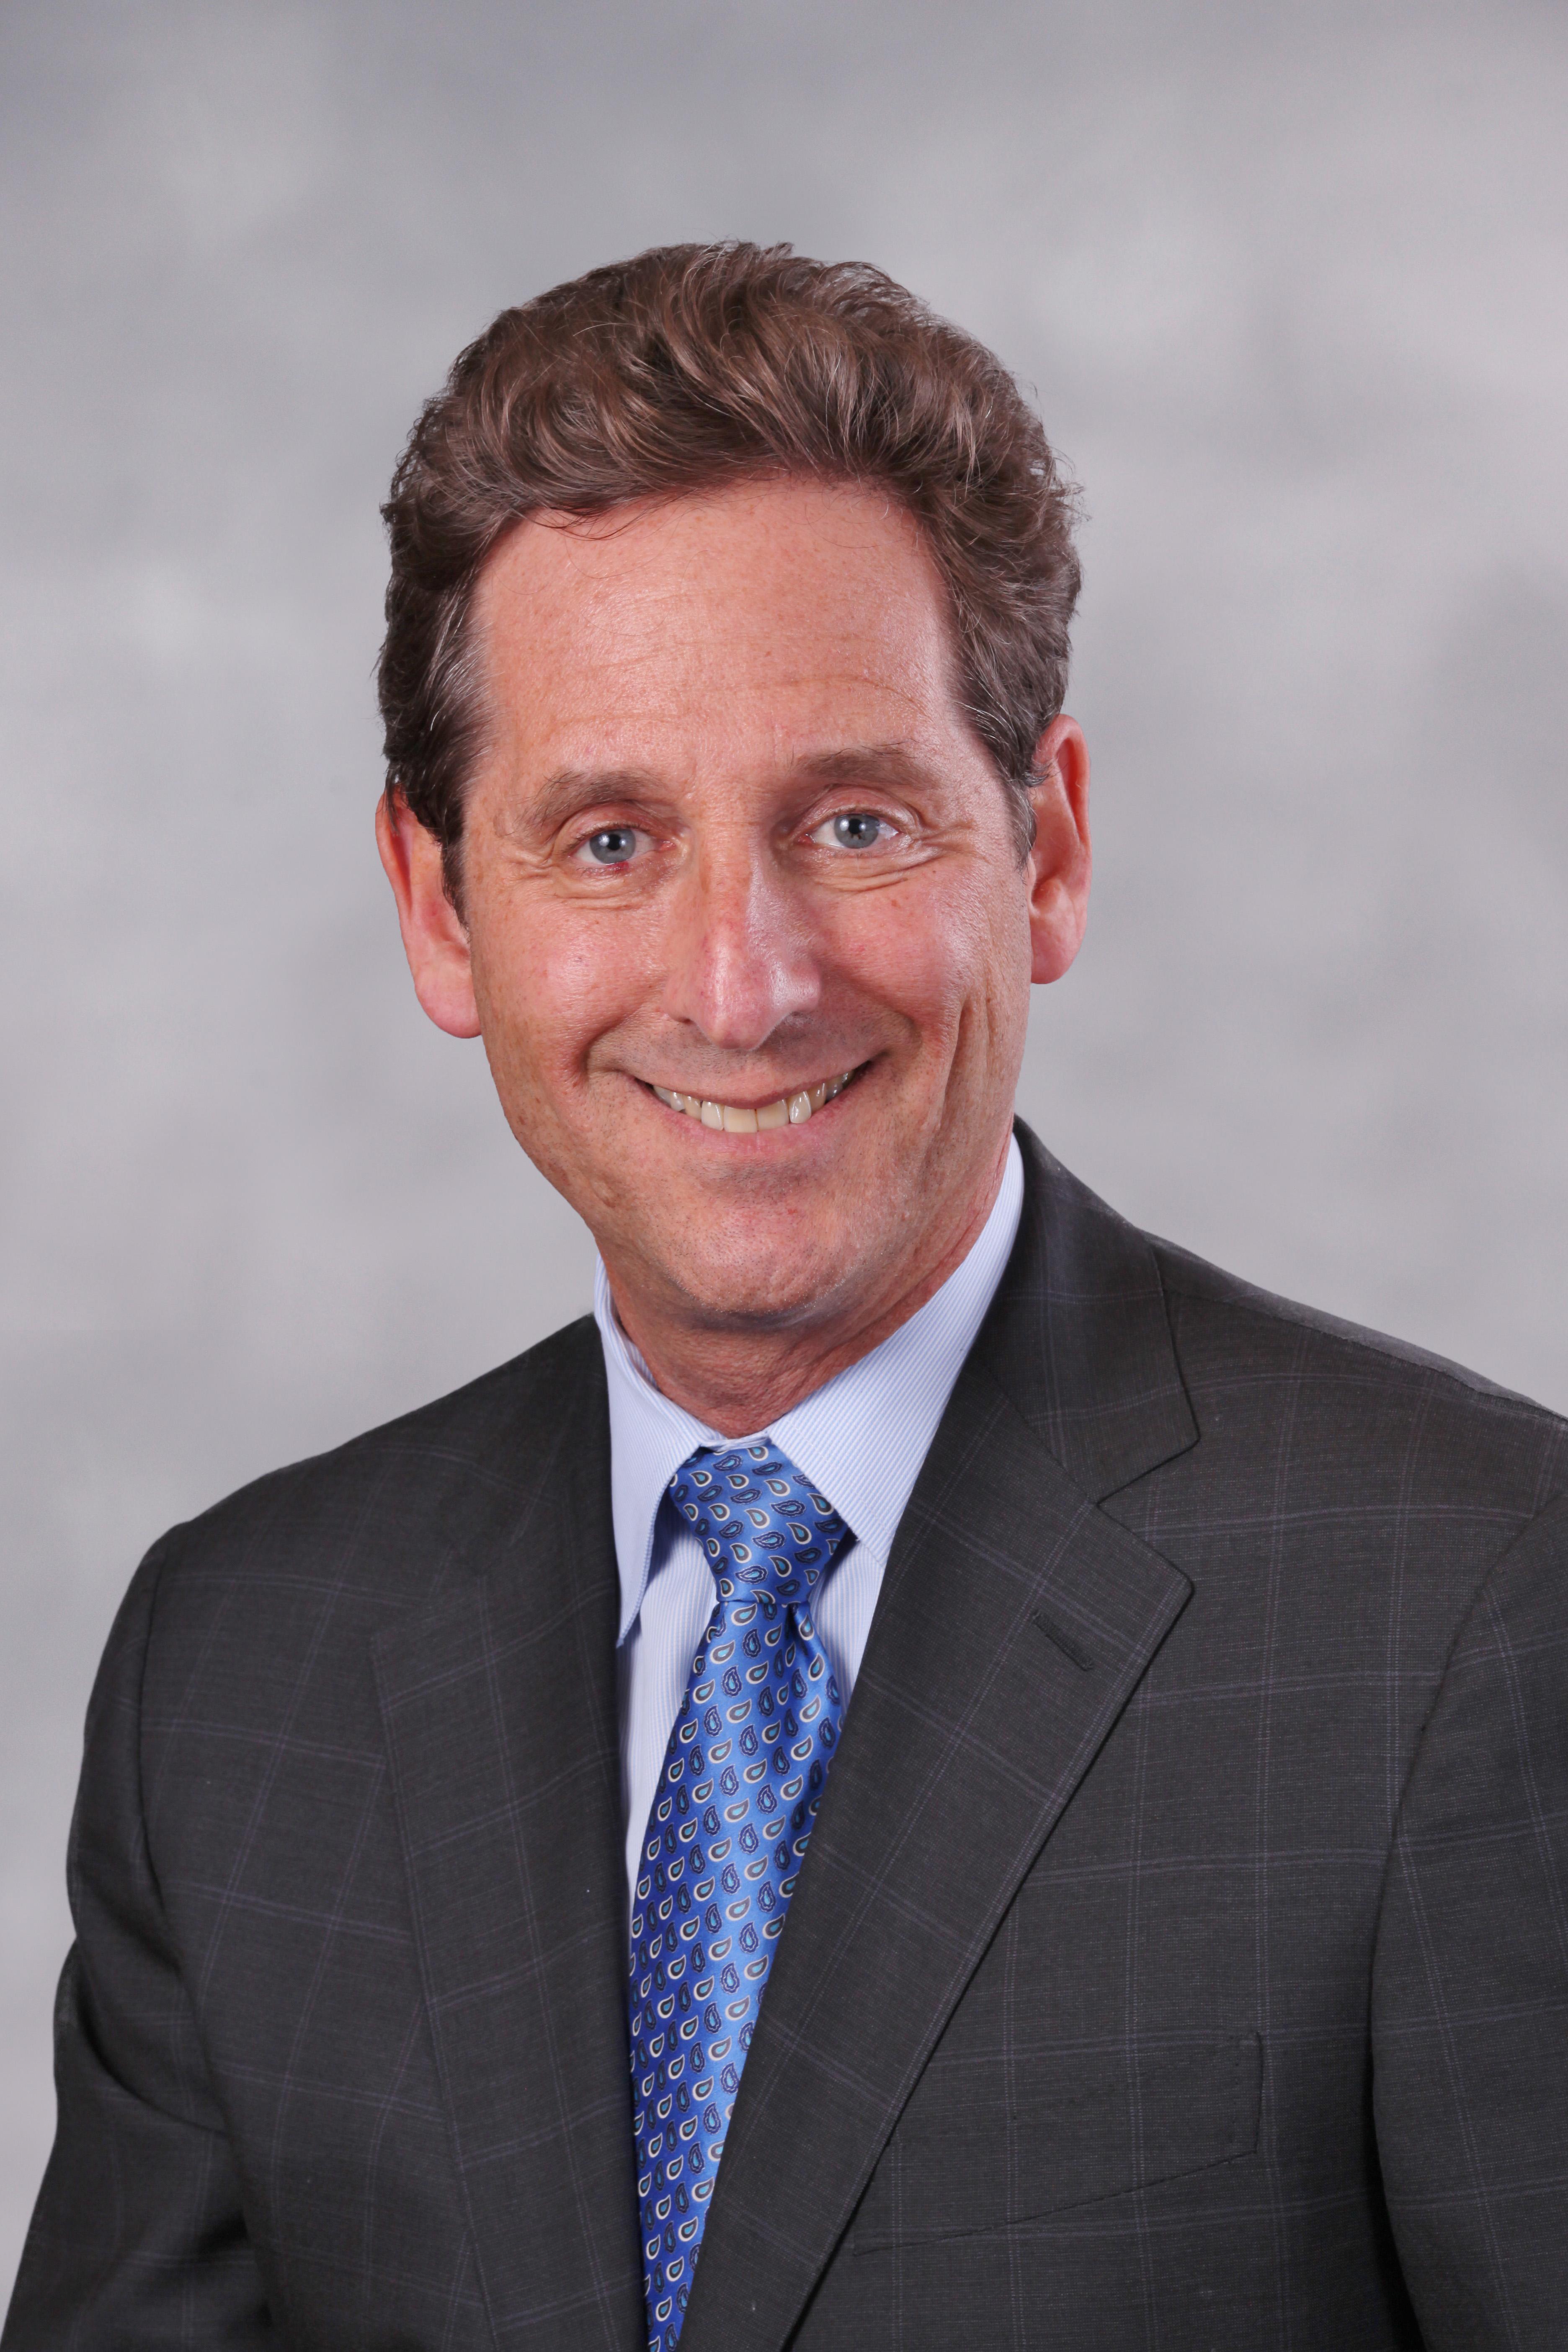 Howard Kivell, MD, FACS - Urologist